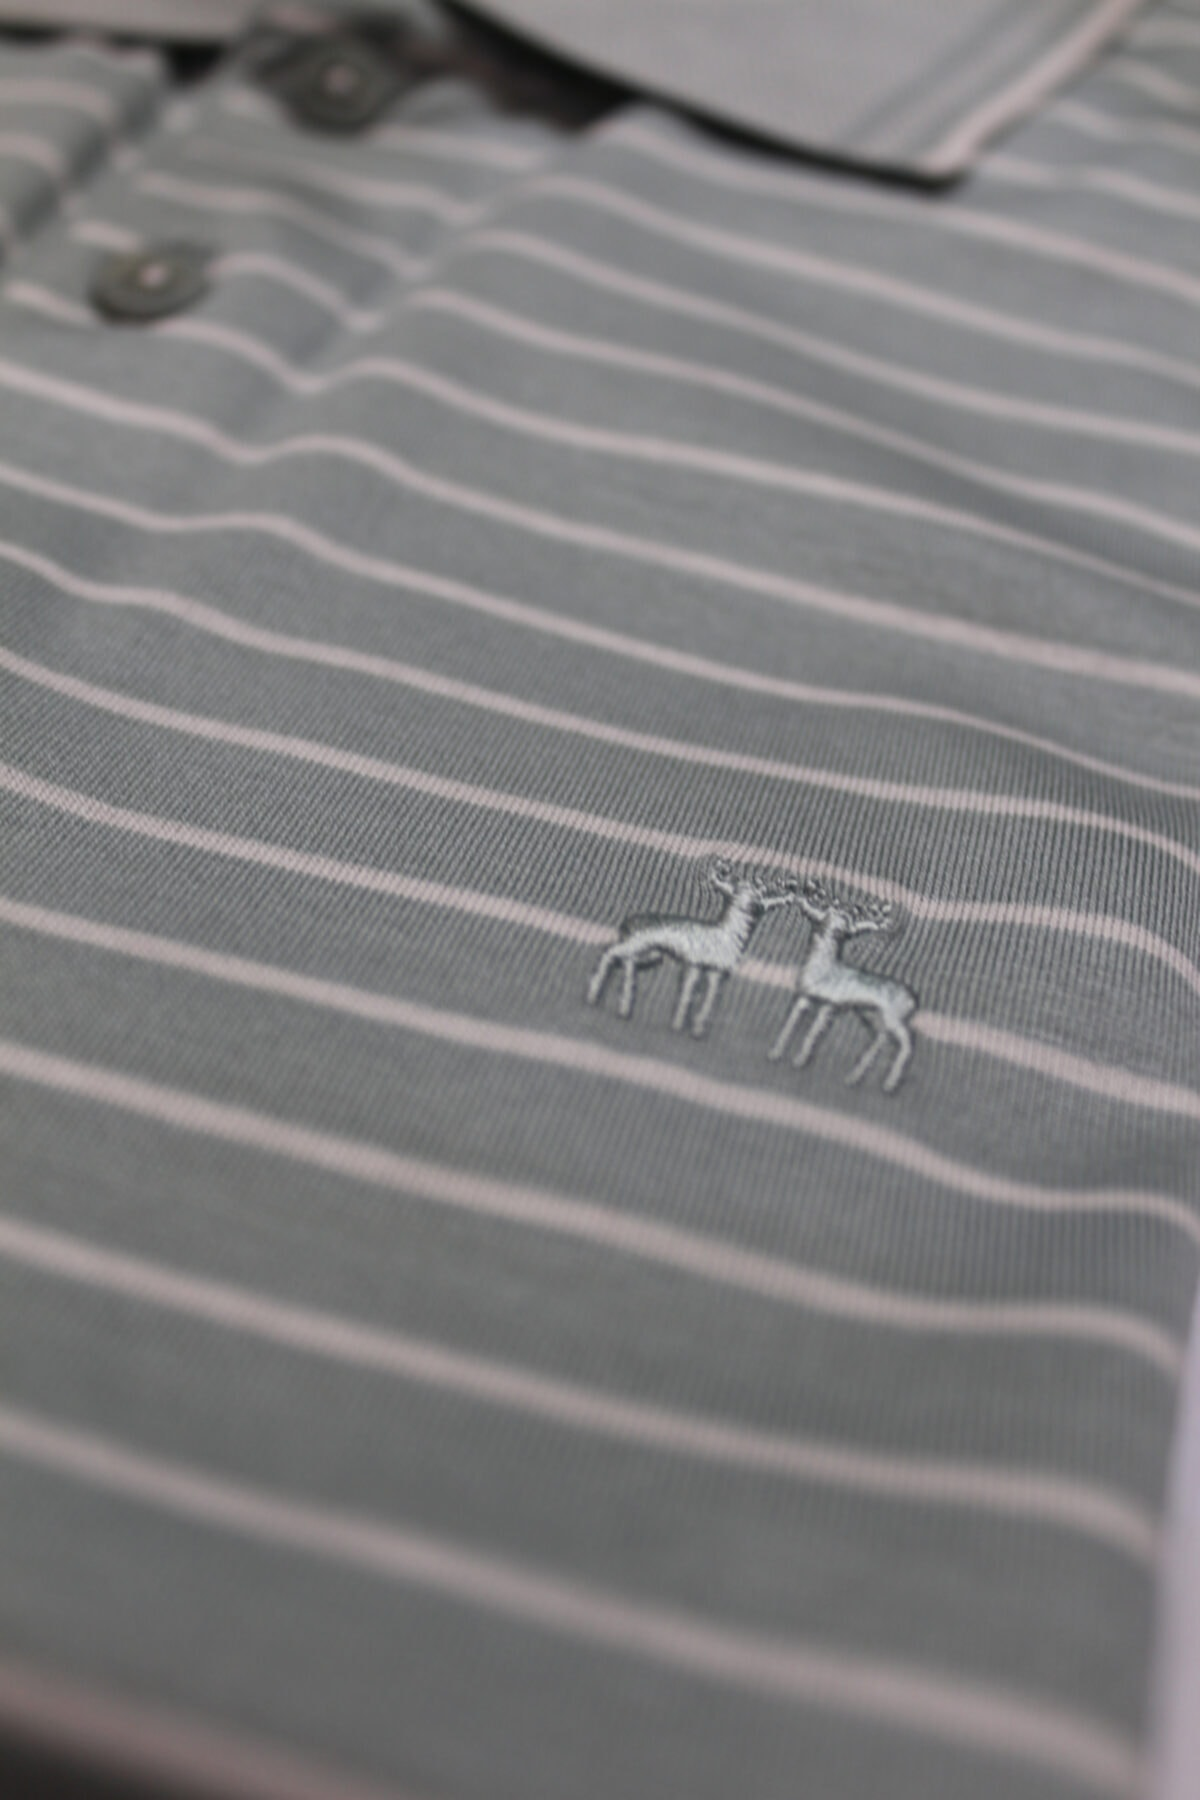 Karaca Erkek Çift Geyik Düğmeli Cepli Merserize Polo Yaka T-shirt 2